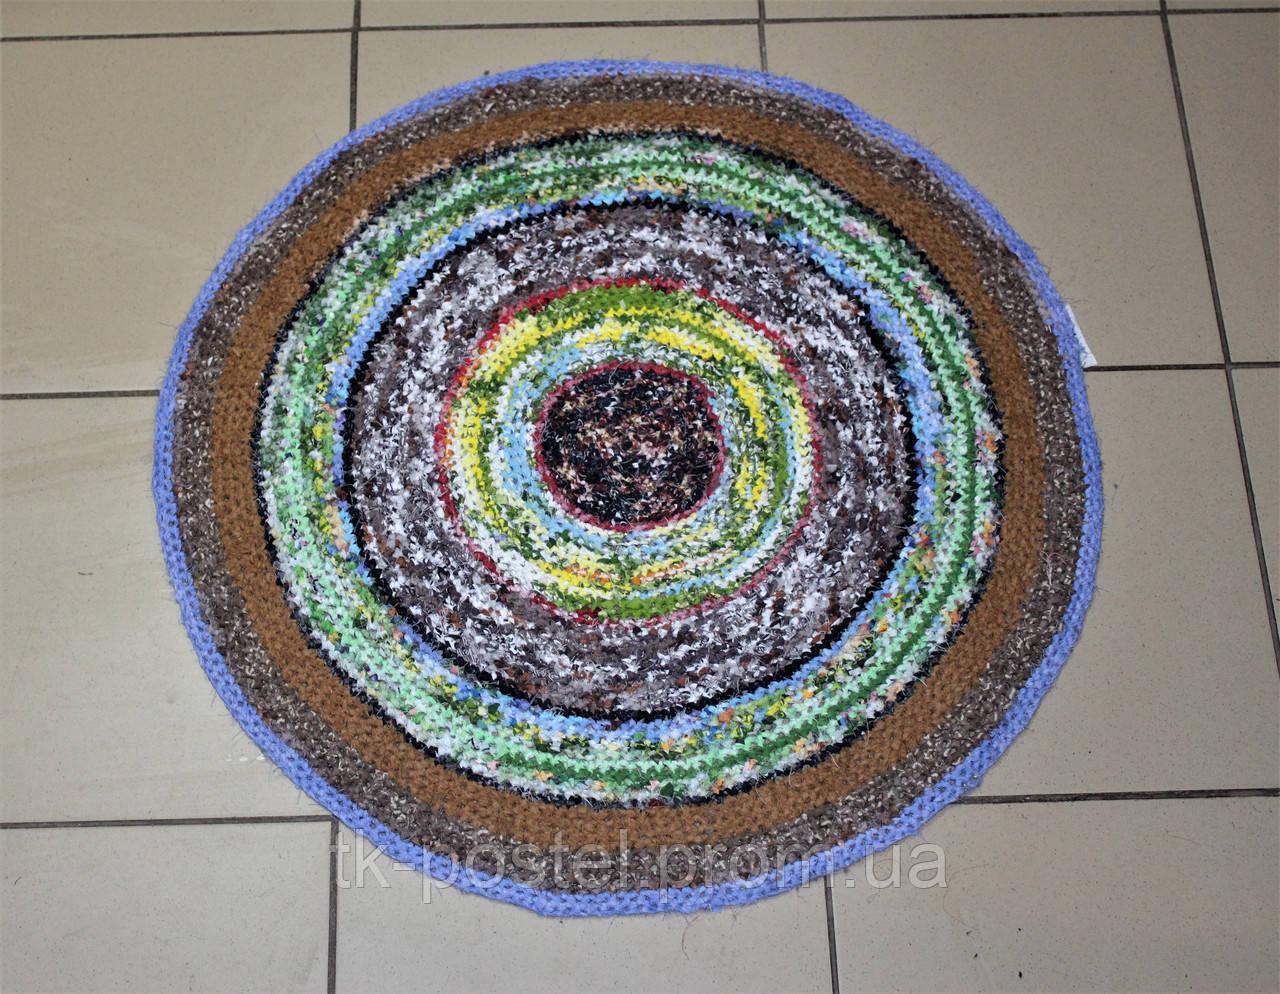 круглый вязаный коврик для ванны и туалета 65 см бязь цена 130 грн